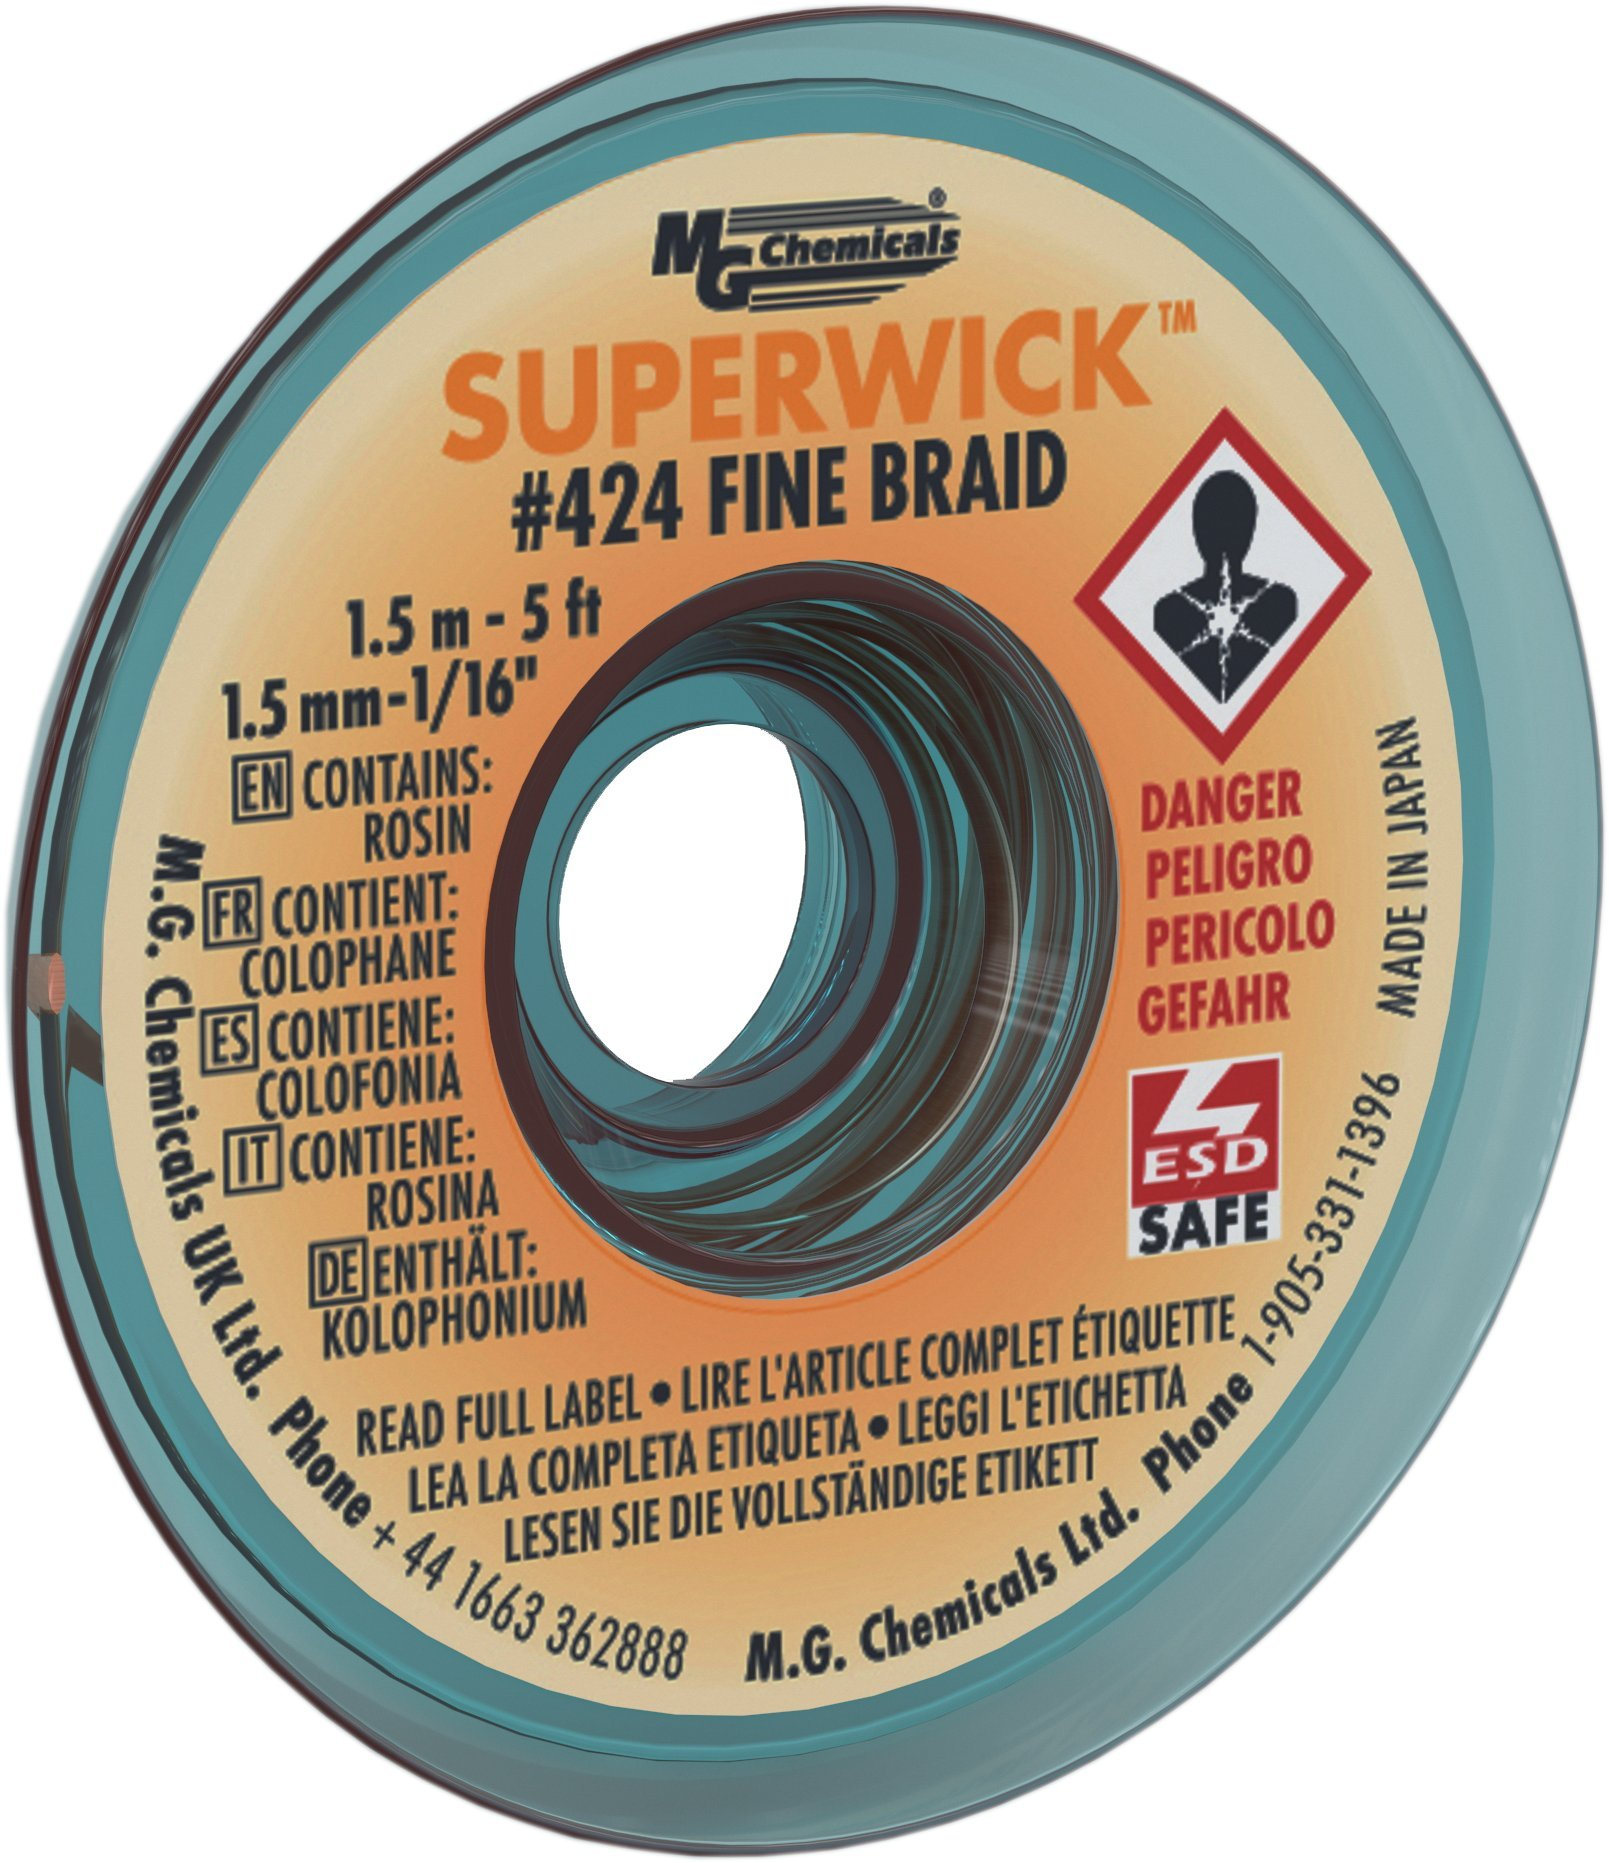 "MG Chemicals Desoldering Braid #424 Fine Braid Super Wick with RMA Flux, 5' Length x 0.05"" Width, Yellow"